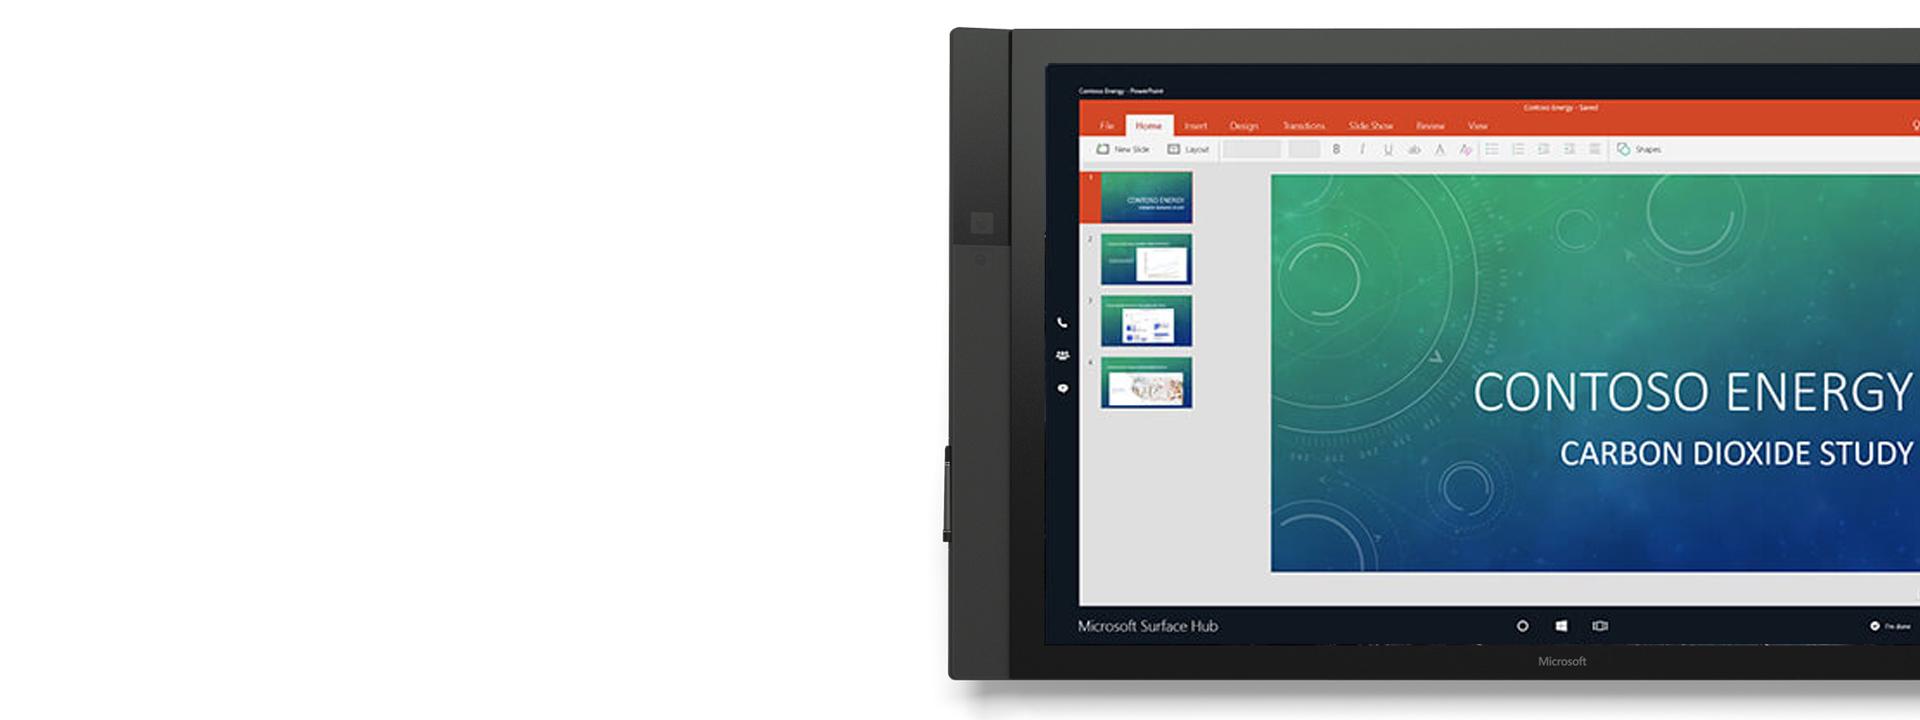 Microsoft PowerPoint visas på Surface Hub.